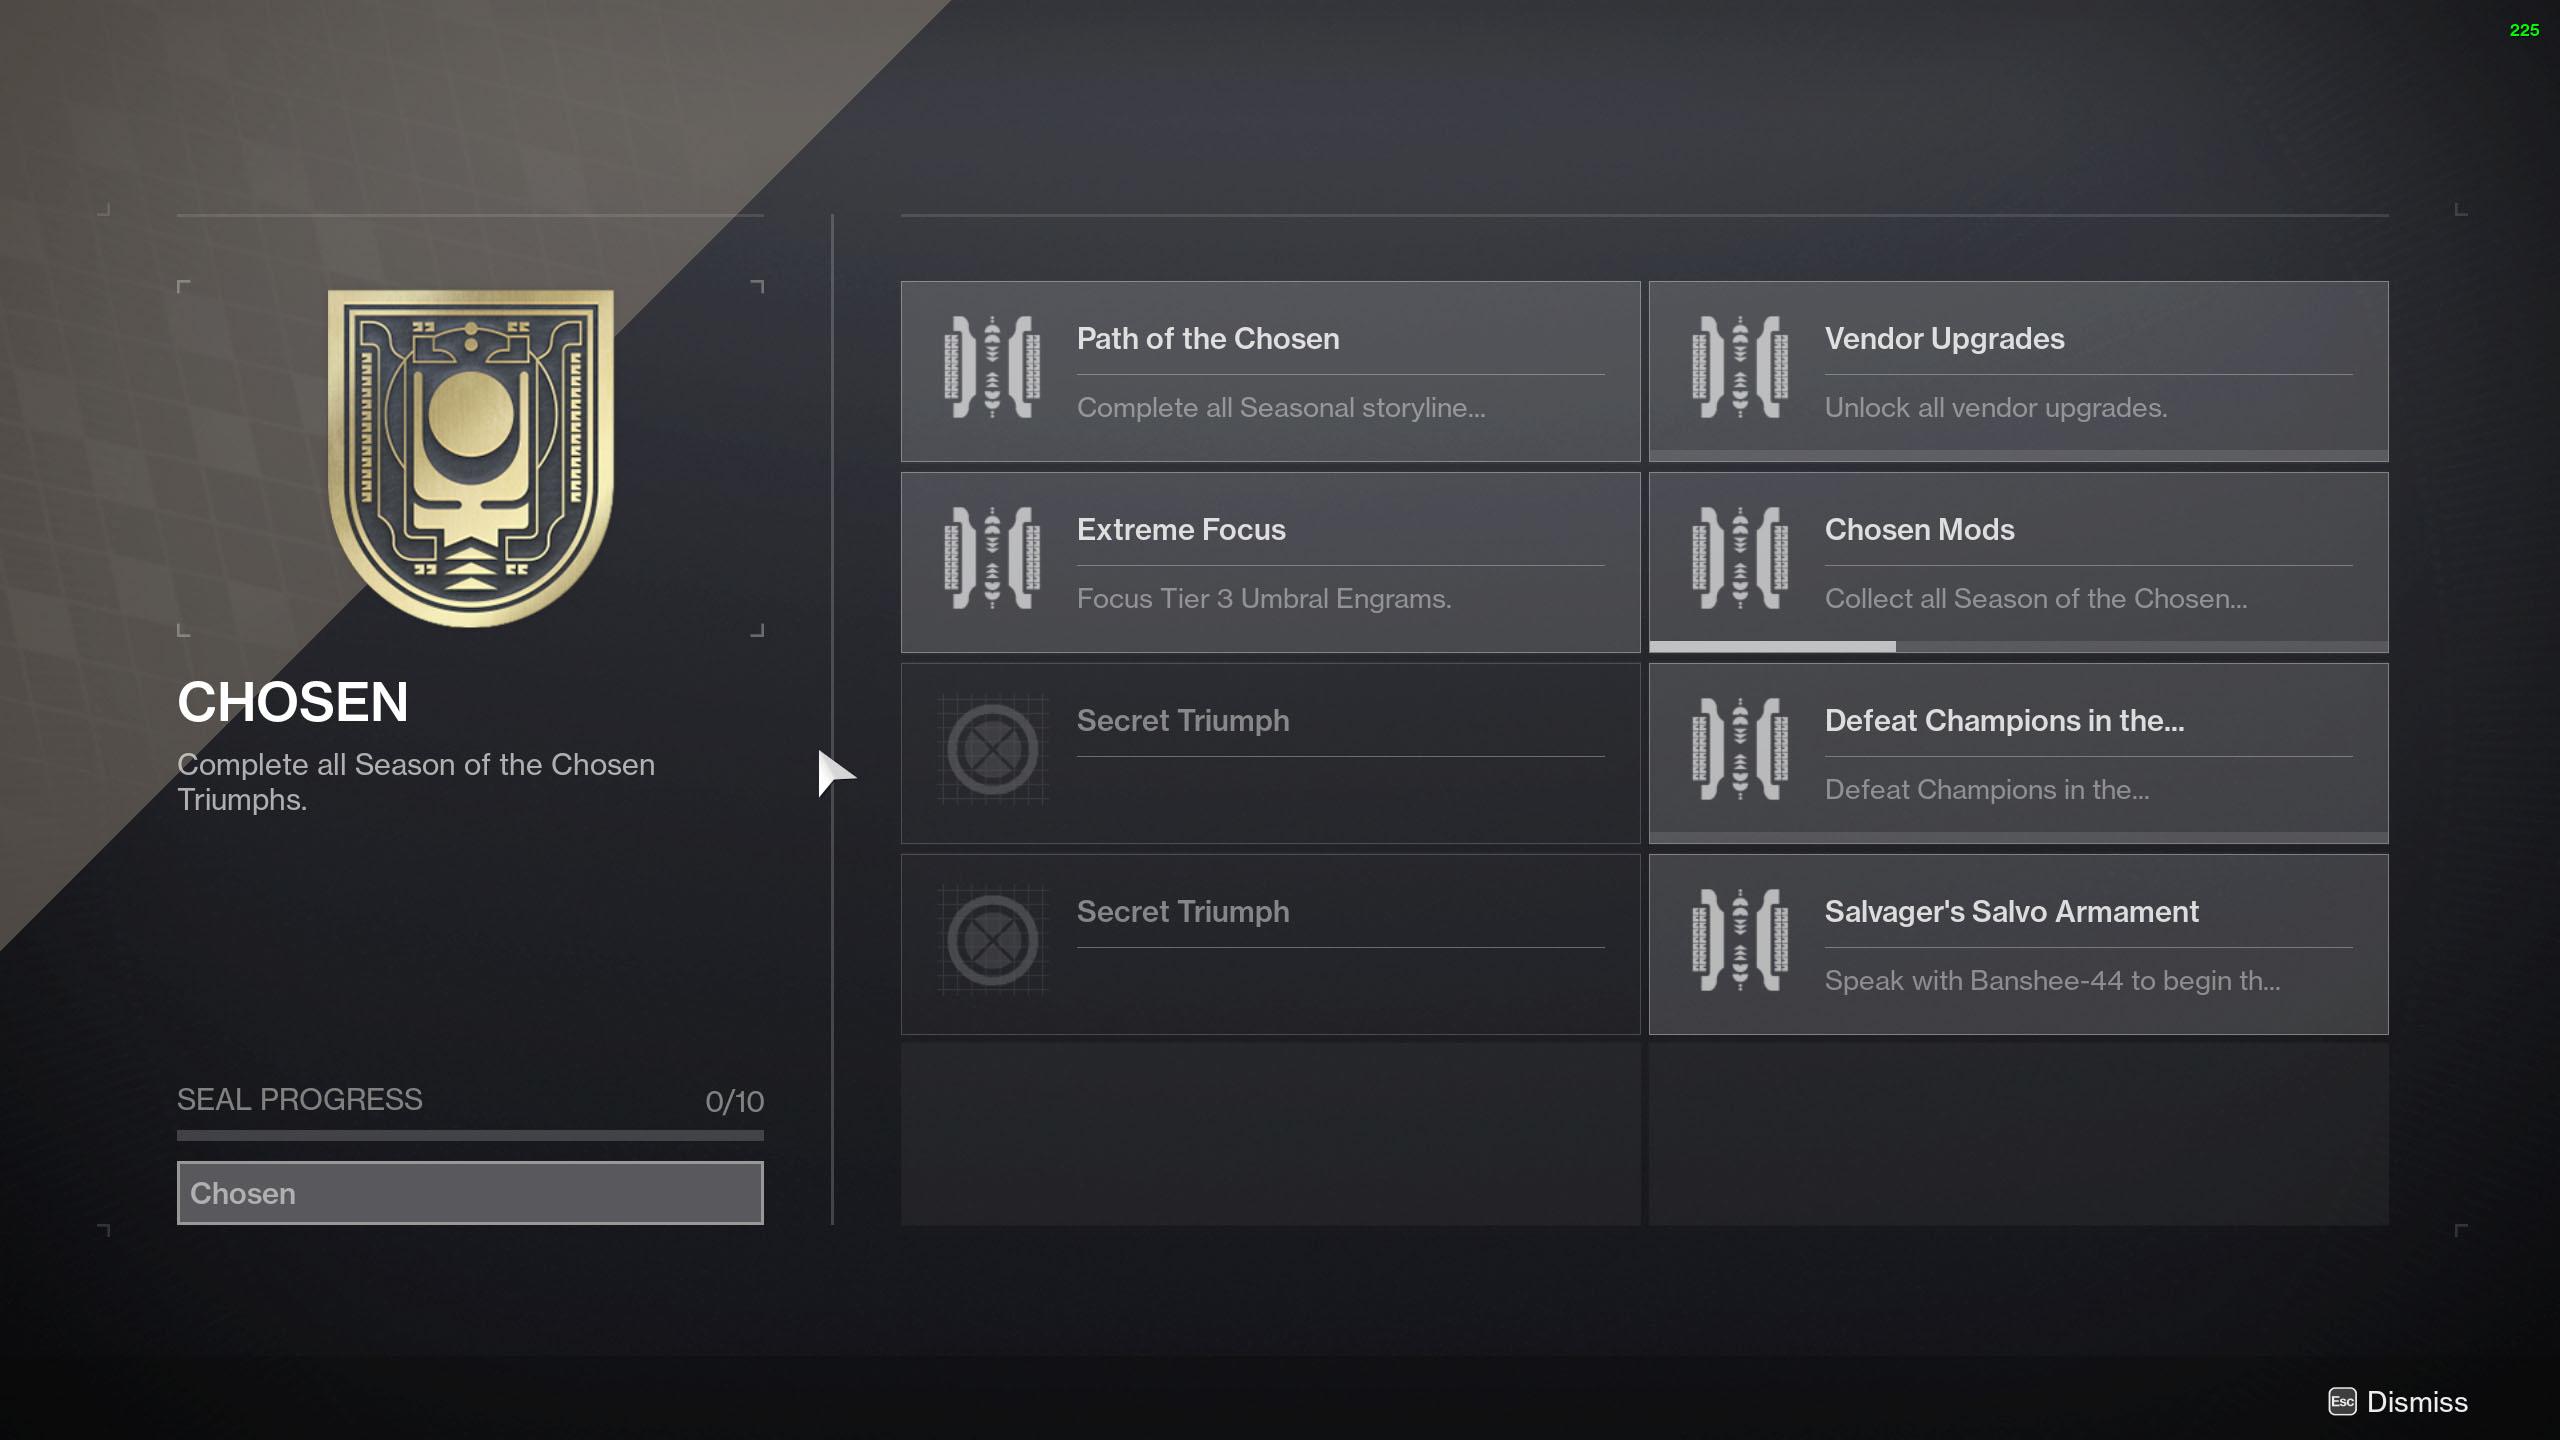 season of the chosen triumphs chosen title seal